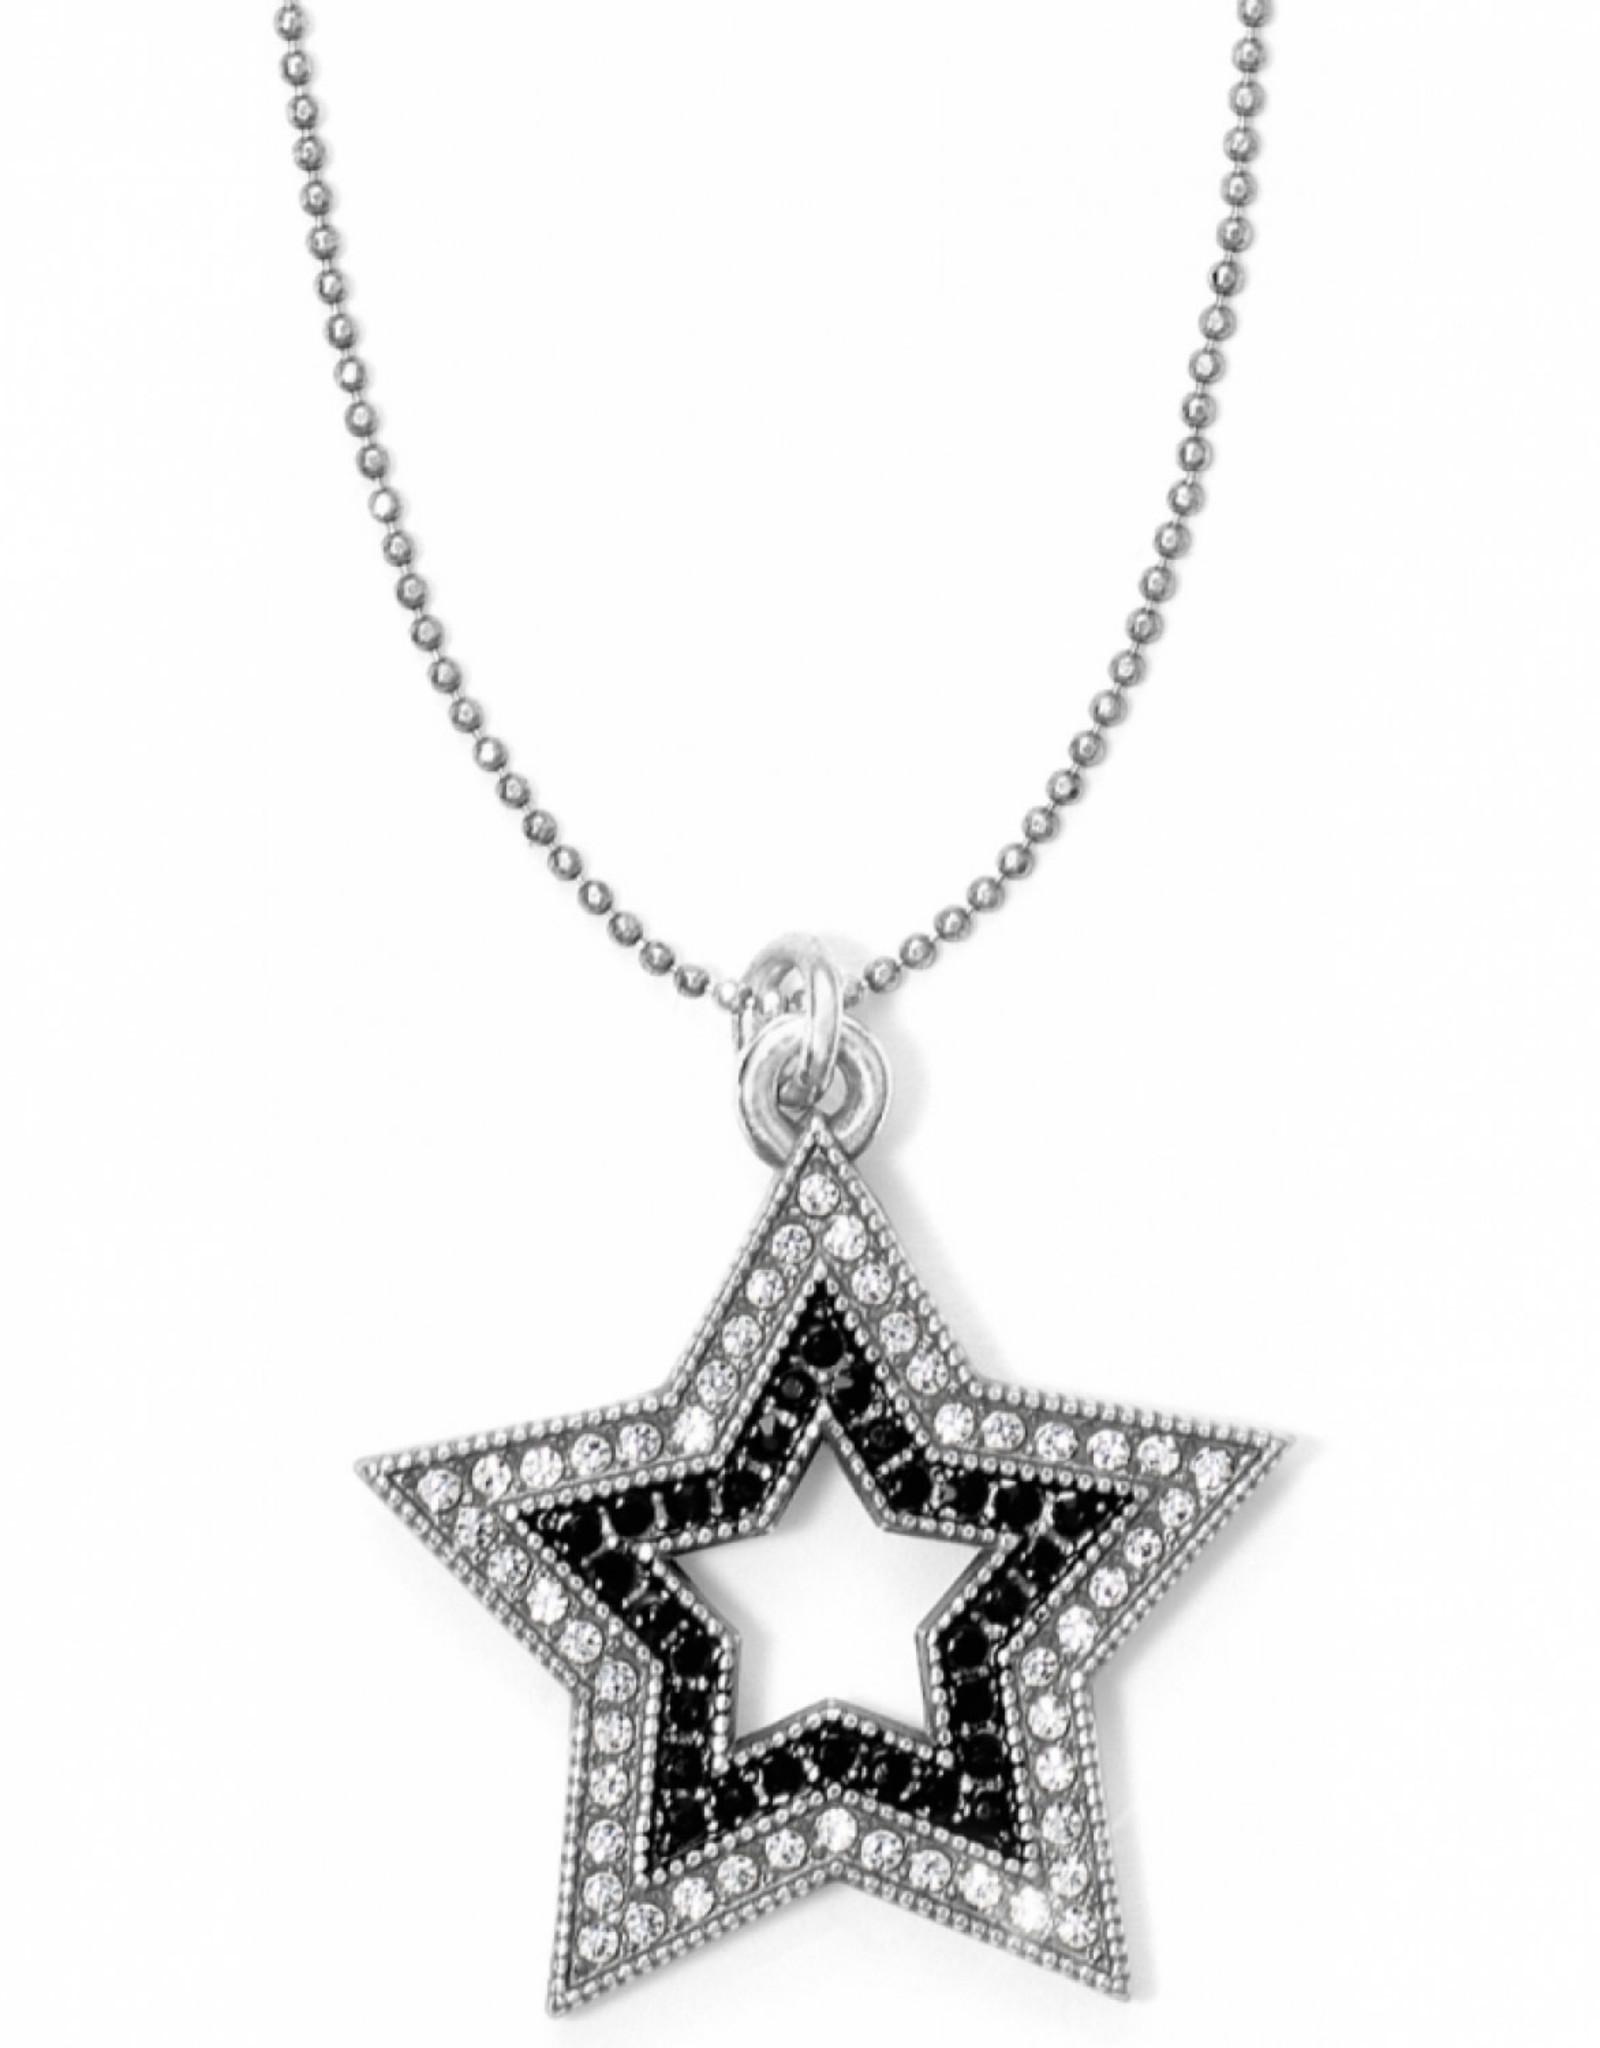 Brighton Brighton Twinkle Nights Star Necklace